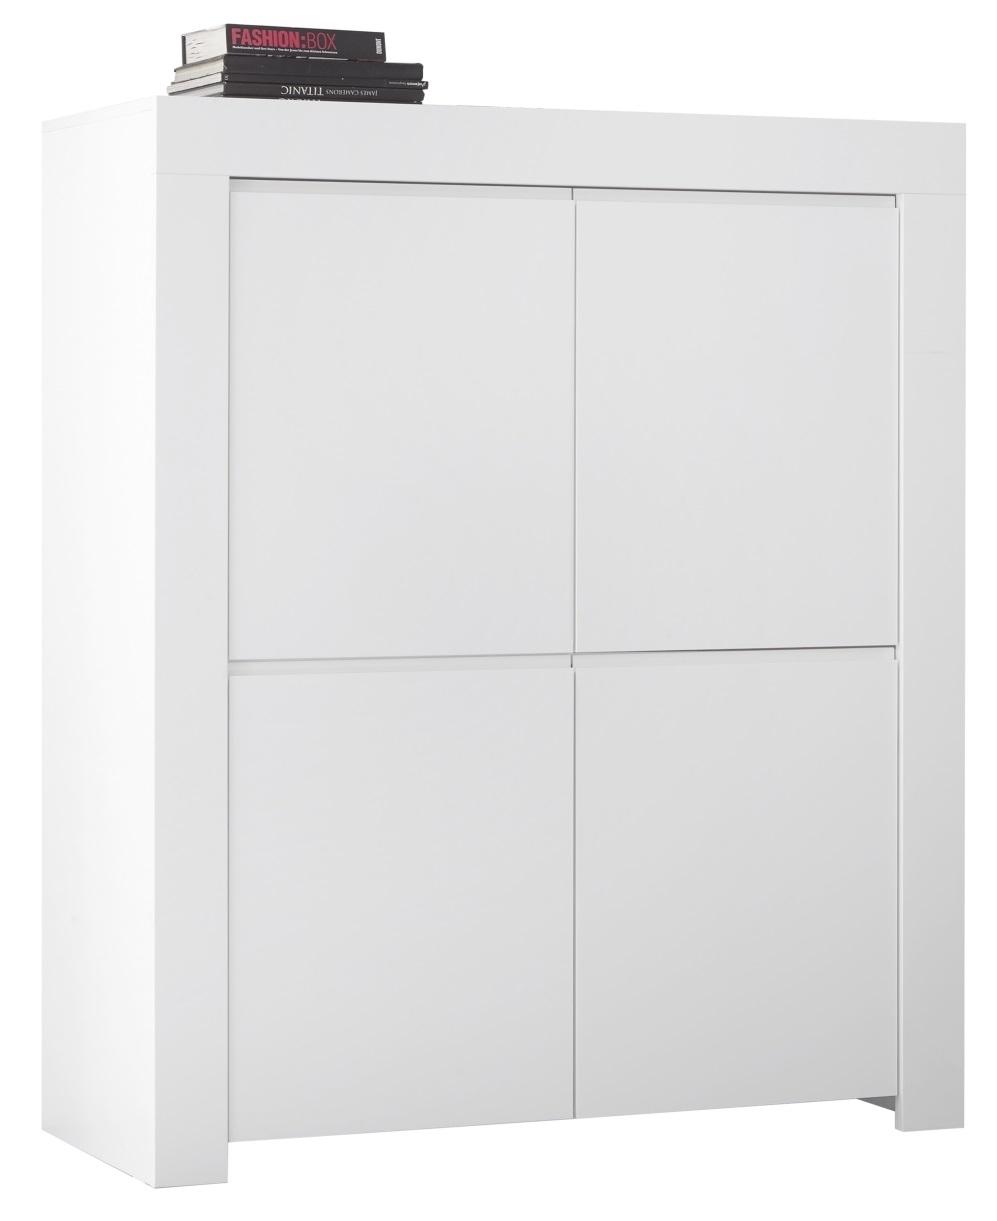 Opbergkast Firenze 140 cm hoog in mat wit | Pesaro Mobilia